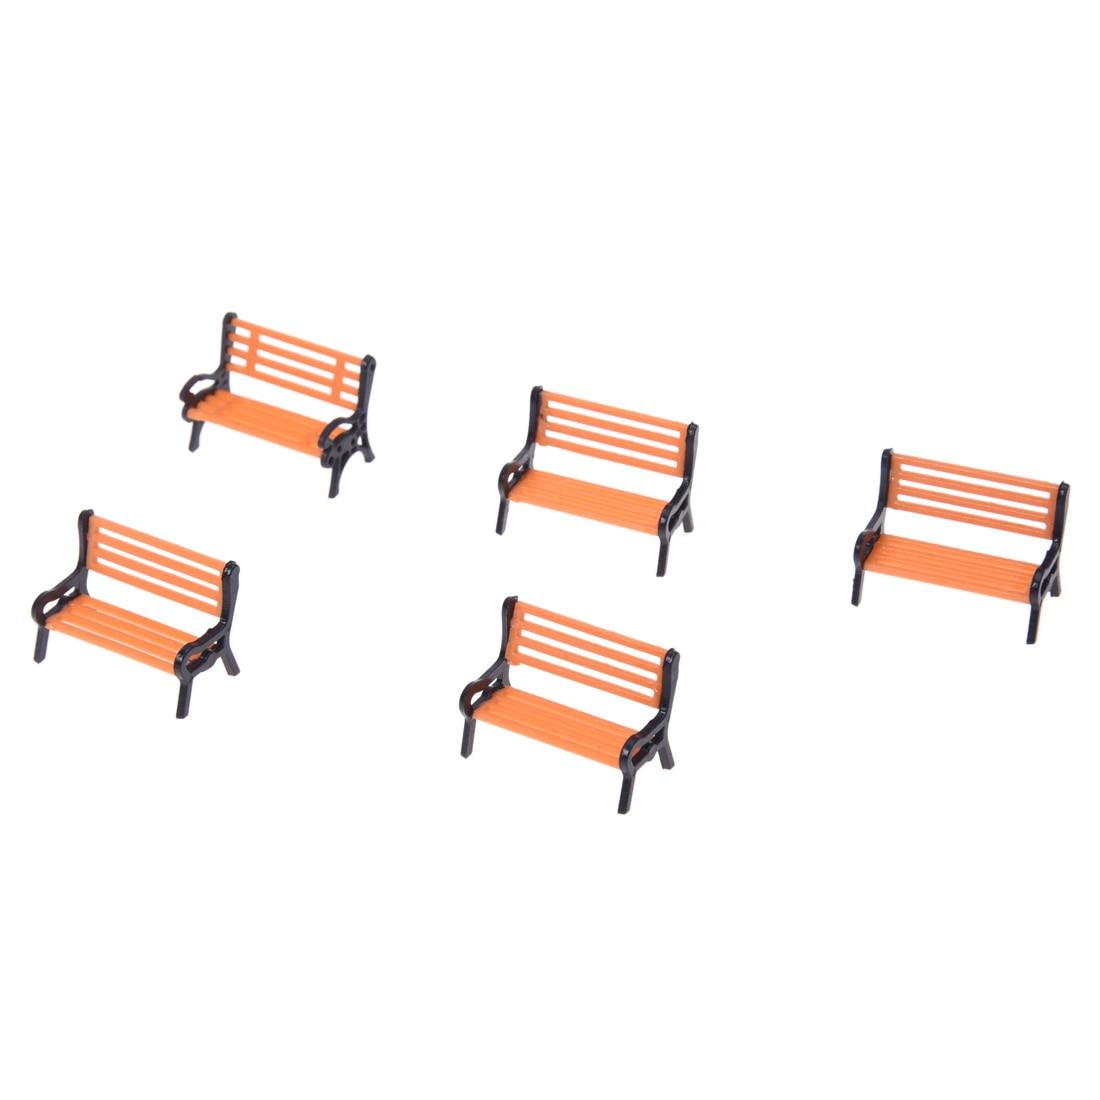 Bench-Chair Platform Park Settee Modeling Railway Street-Seats Courtyard 1:50-Scale 5pcs